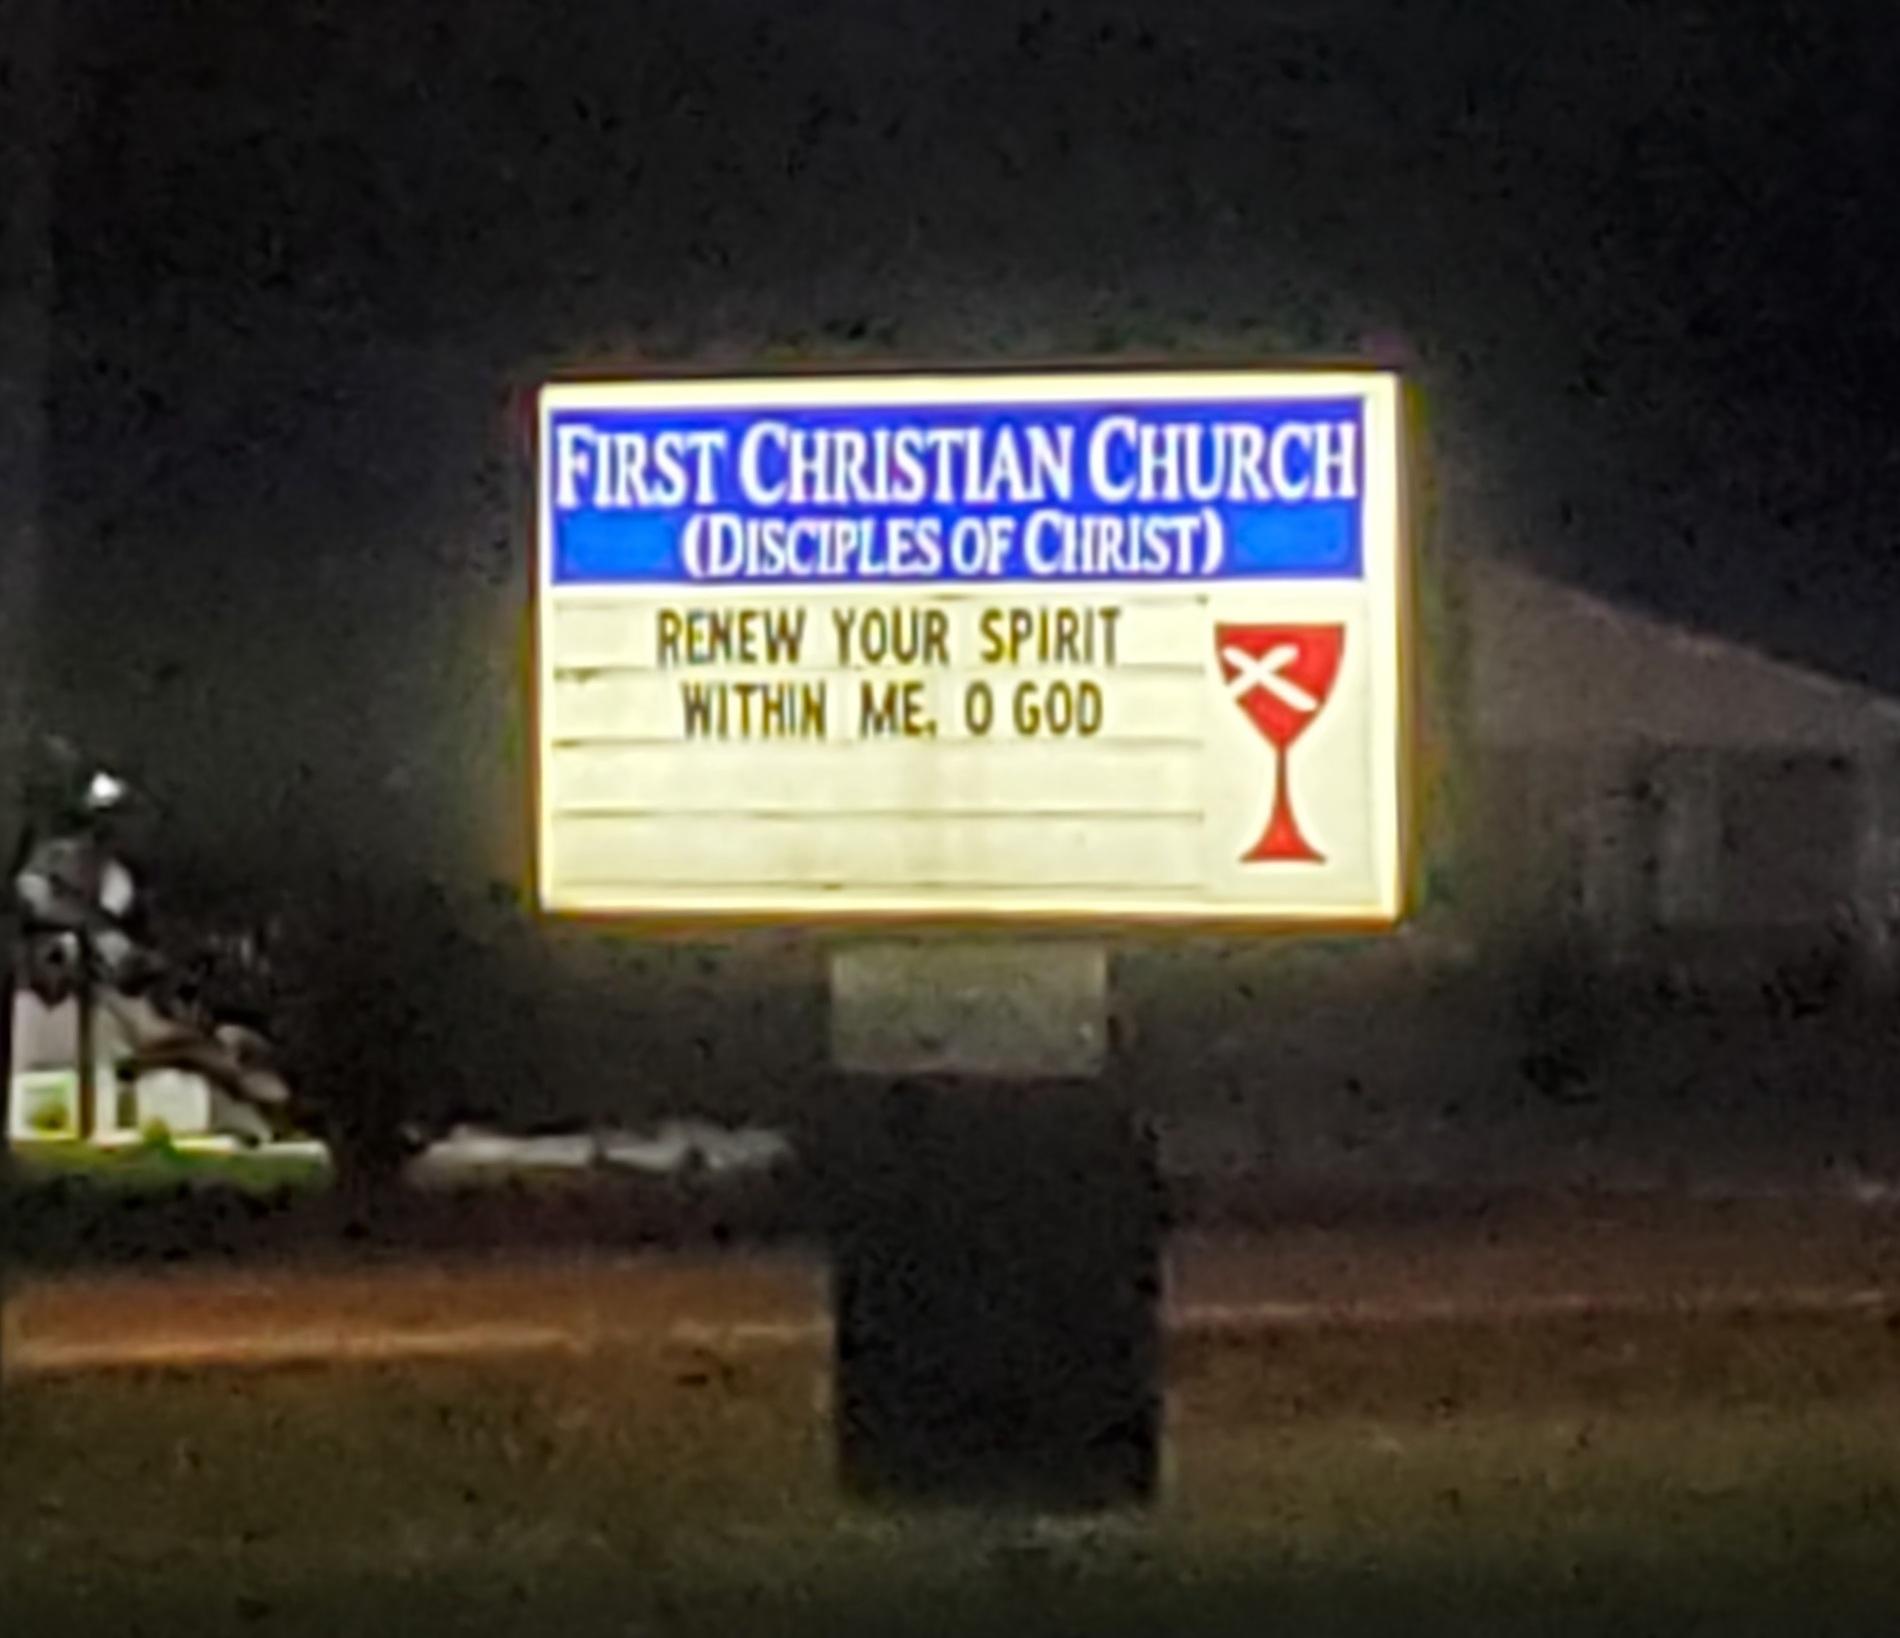 Lighted FCC sign